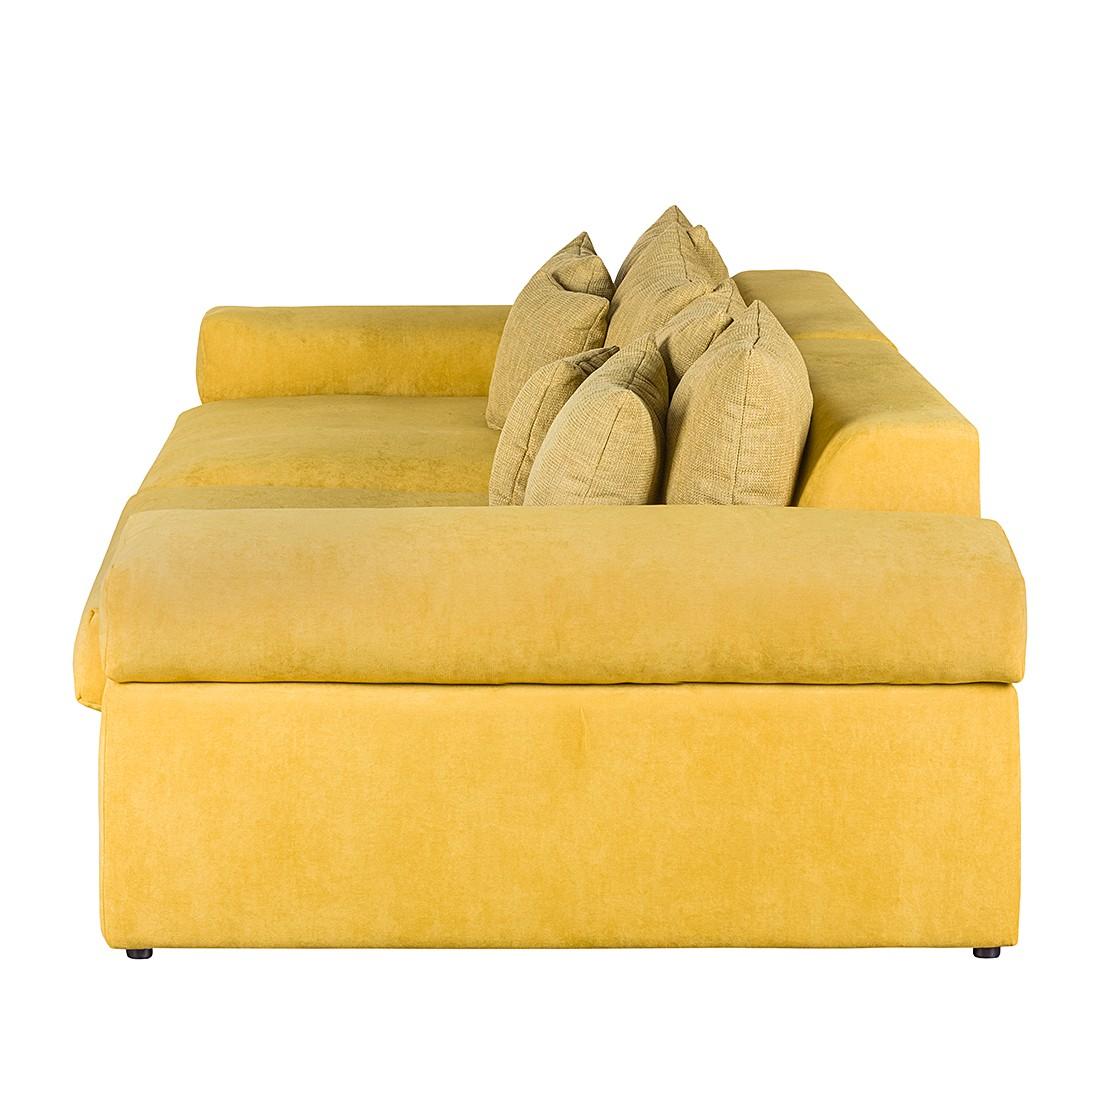 bigsofa naomi ii samtstoff gelb mooved m wu 03. Black Bedroom Furniture Sets. Home Design Ideas